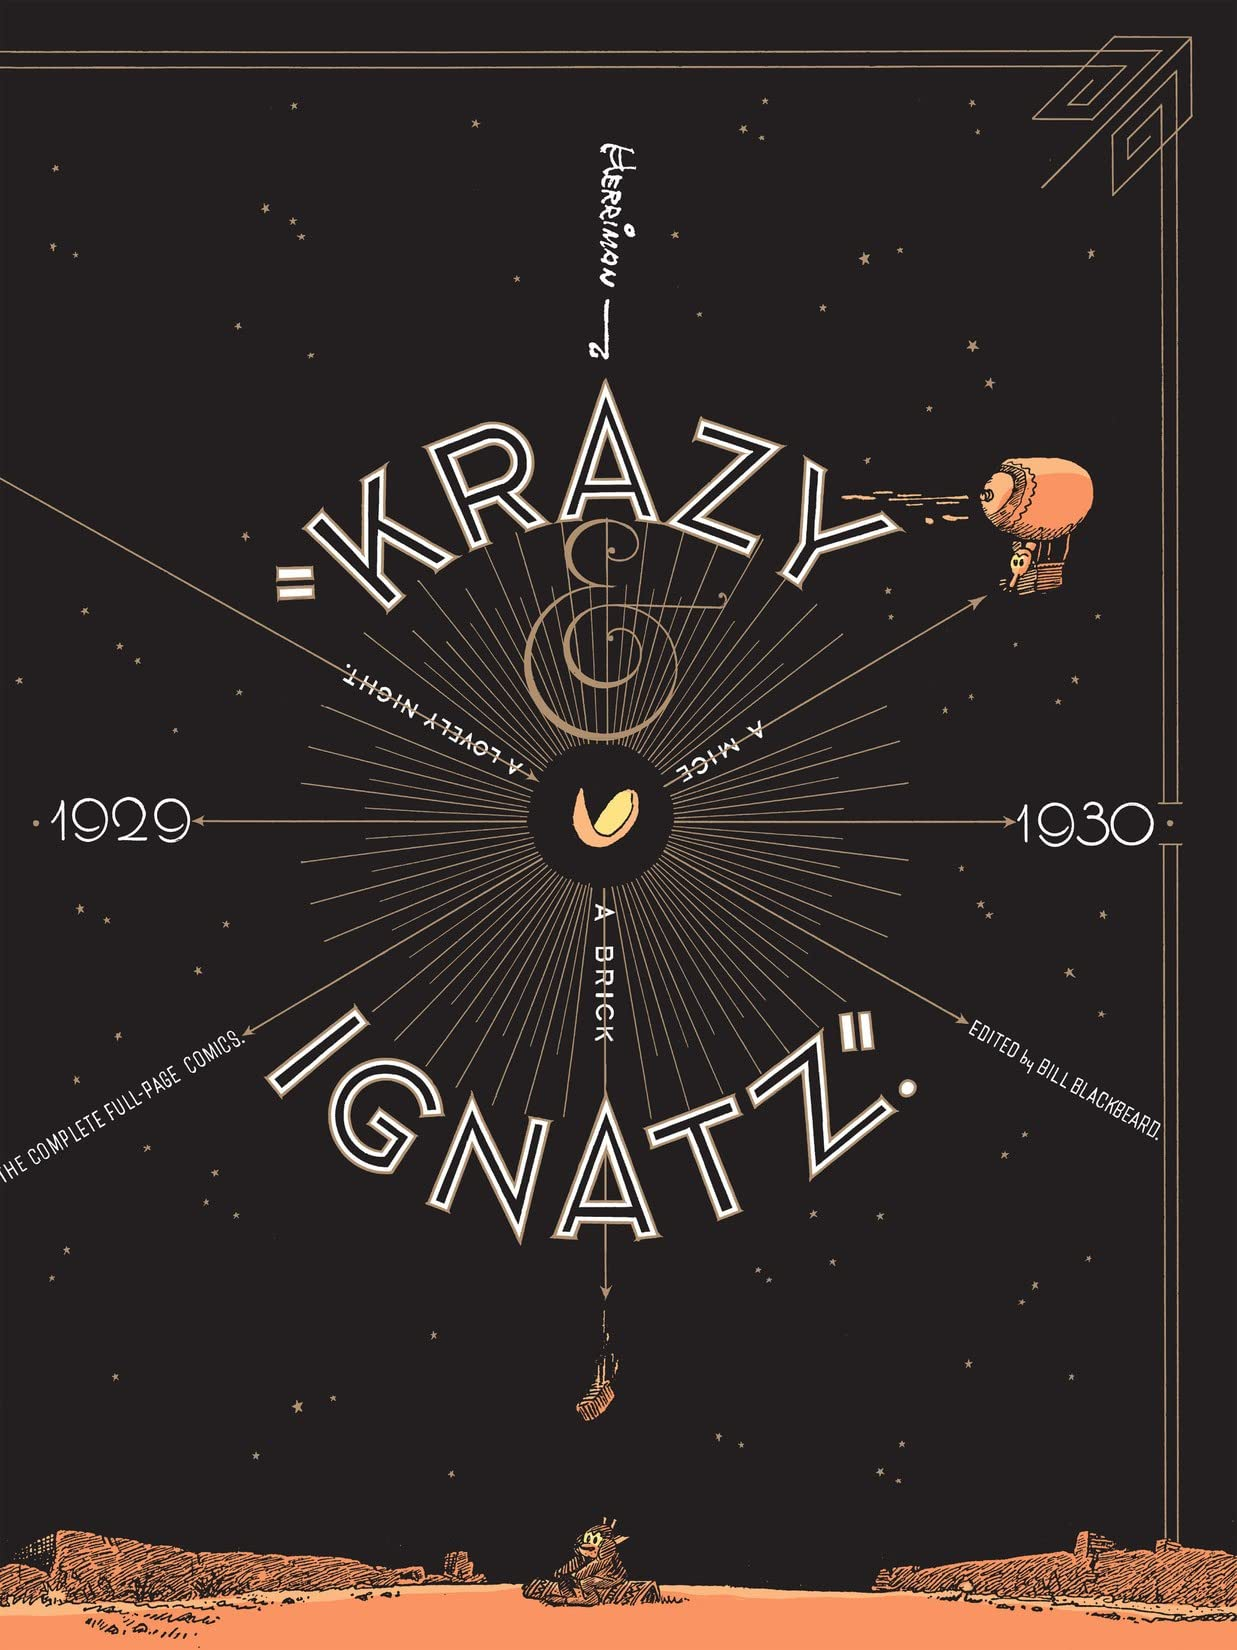 Krazy & Ignatz: 1929-1930 - A Brick, A Mice, A Lovely Night